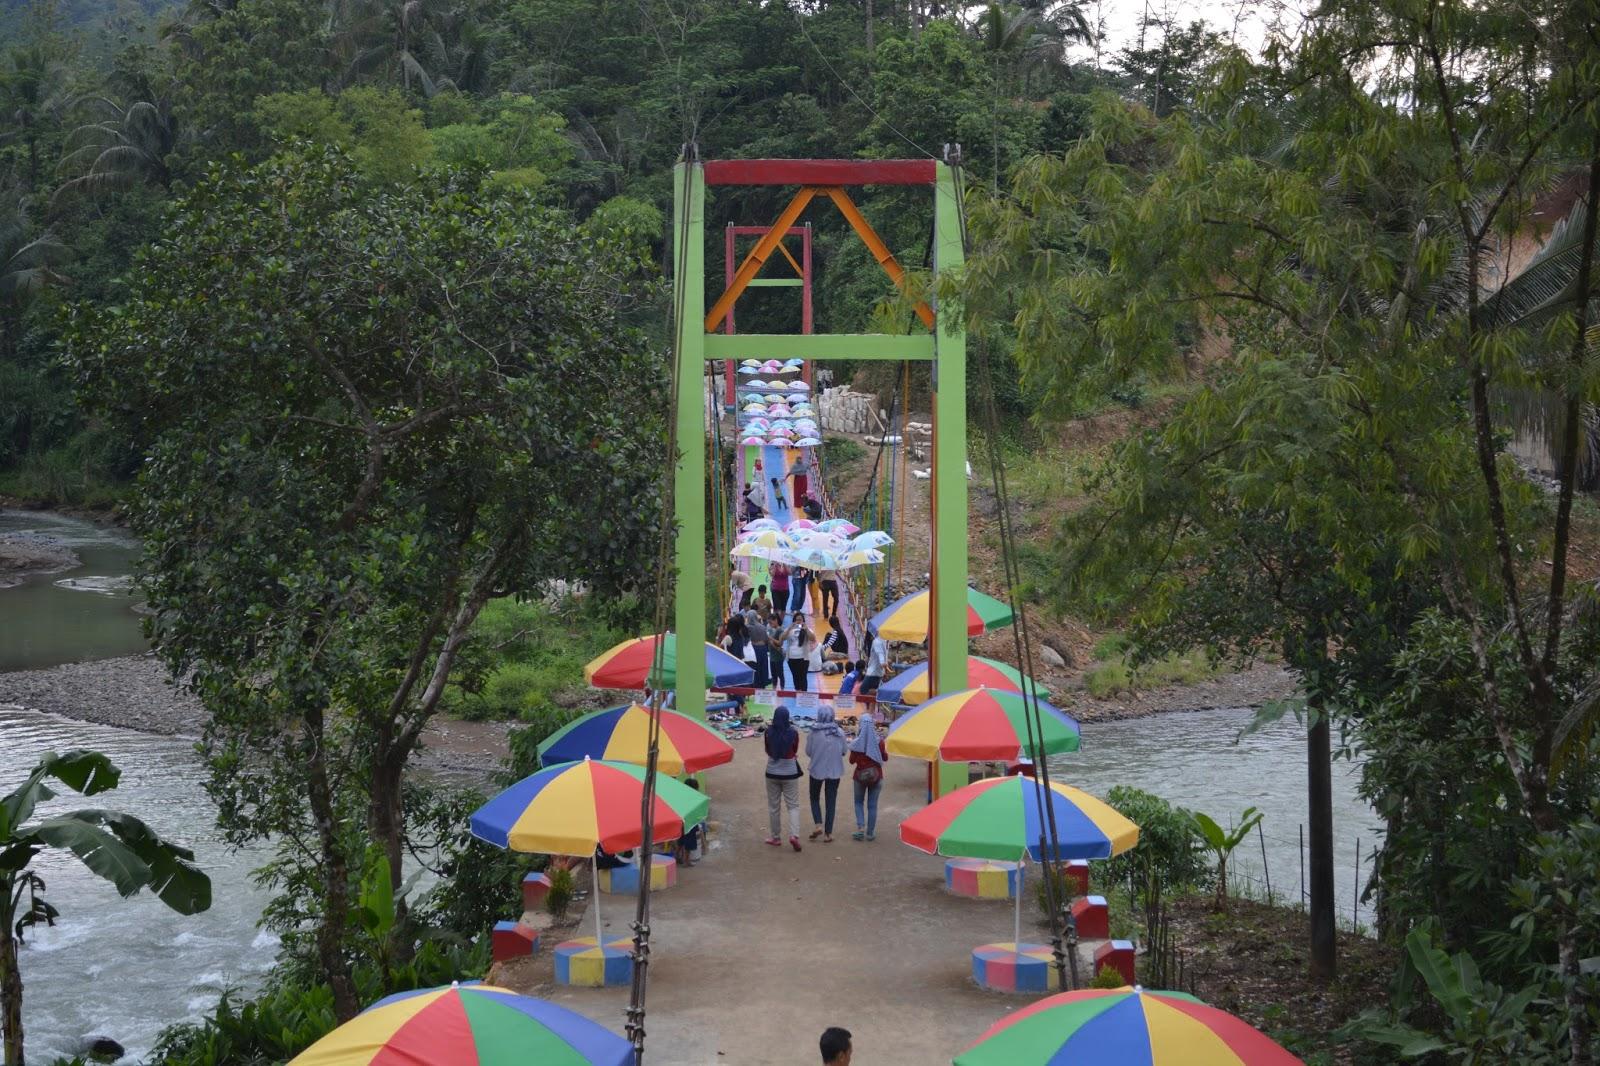 Jembatan Pelangi Kab Purbalingga